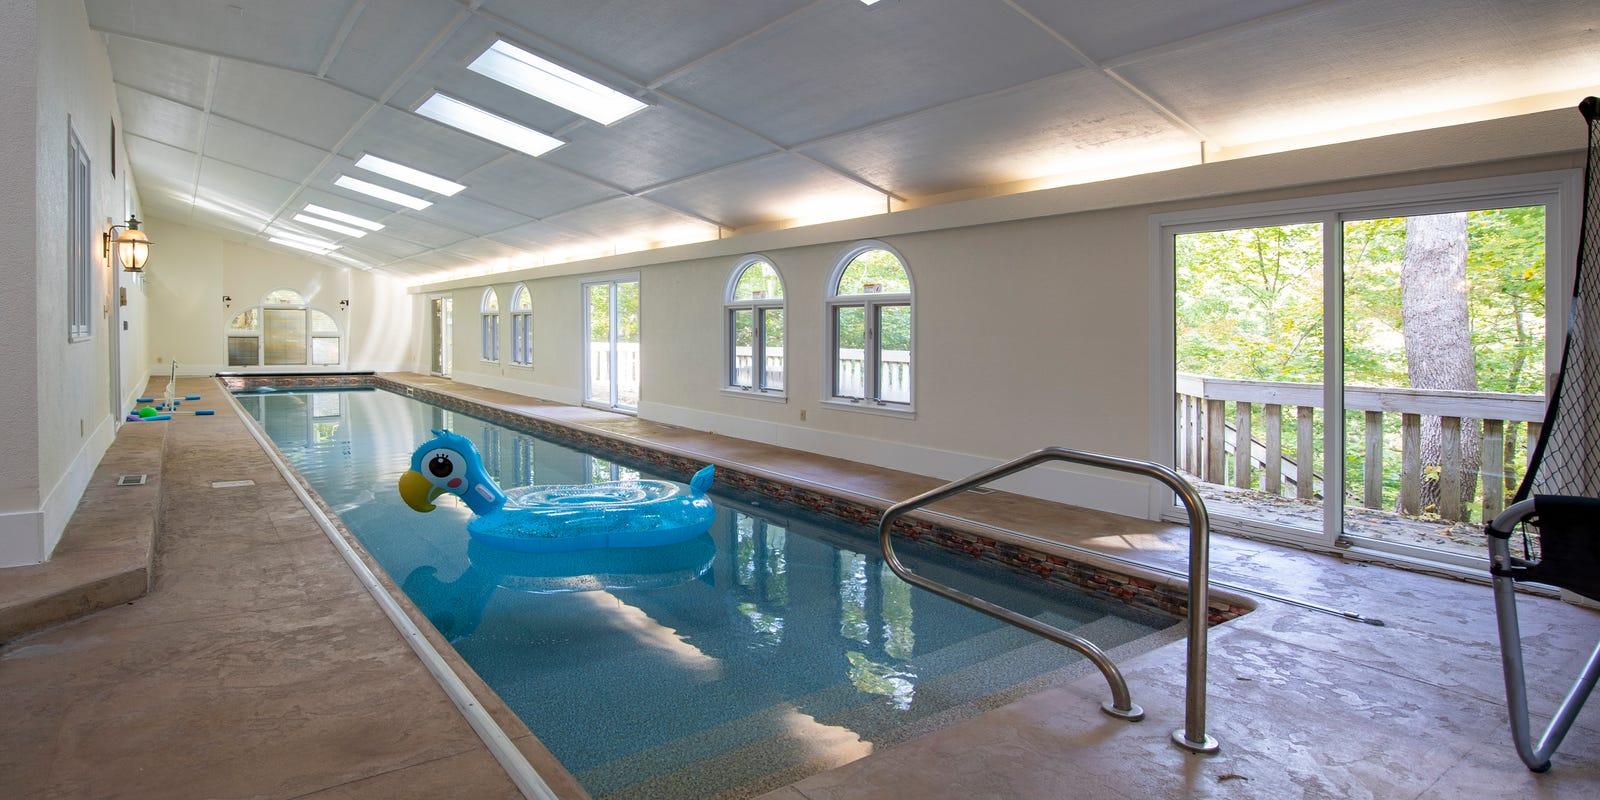 Hot Property Northwestside Home For 410k Has 4 Bedrooms Indoor Pool